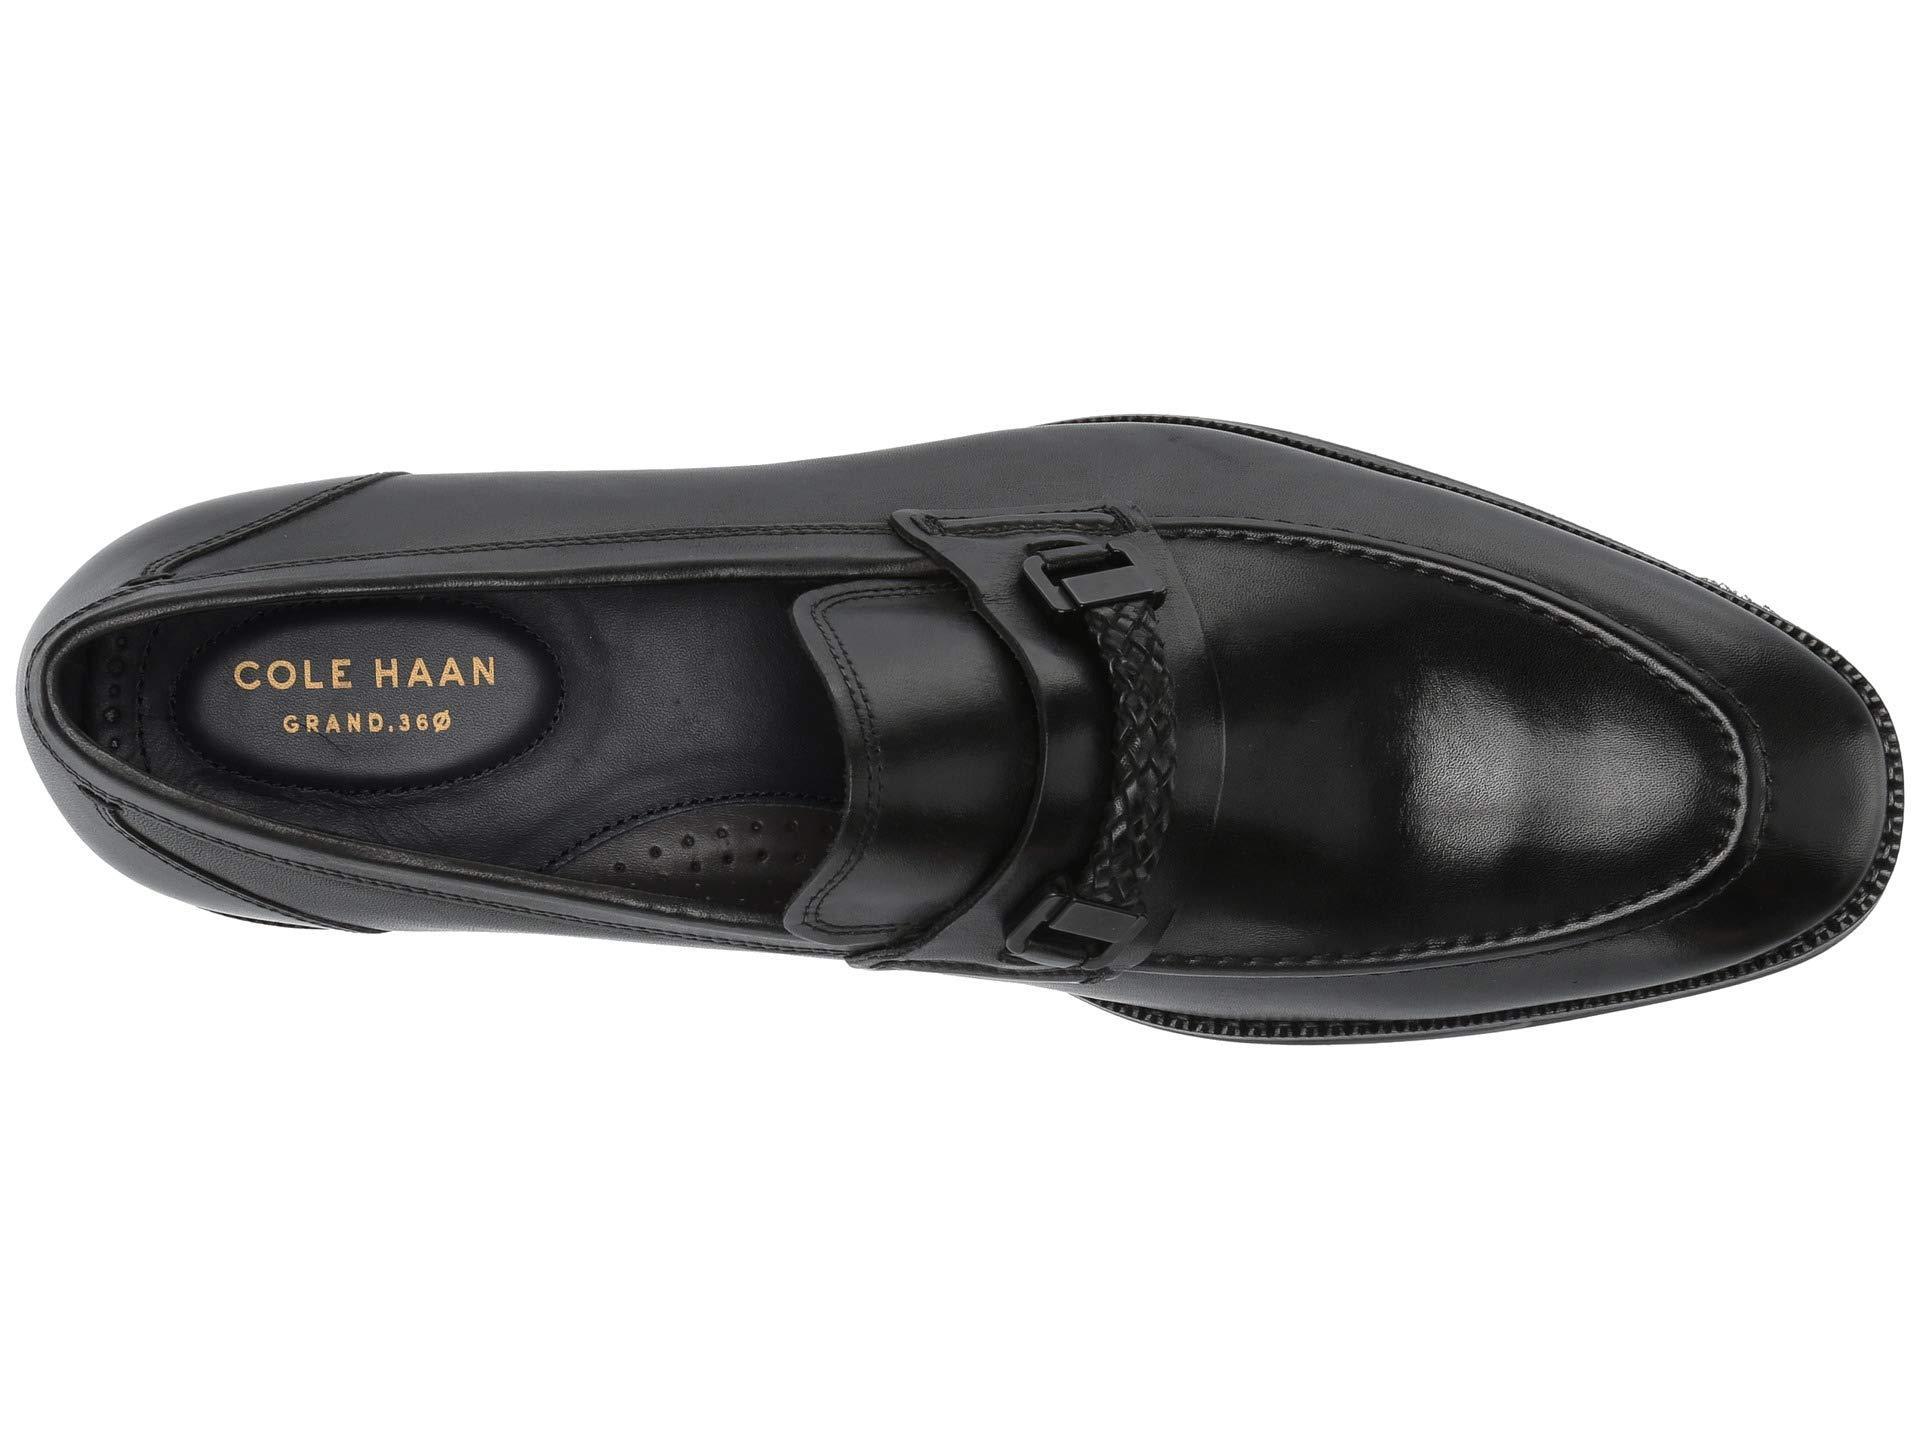 ff2d2842029 Cole Haan - Black Warner Grand Bit Loafer for Men - Lyst. View fullscreen